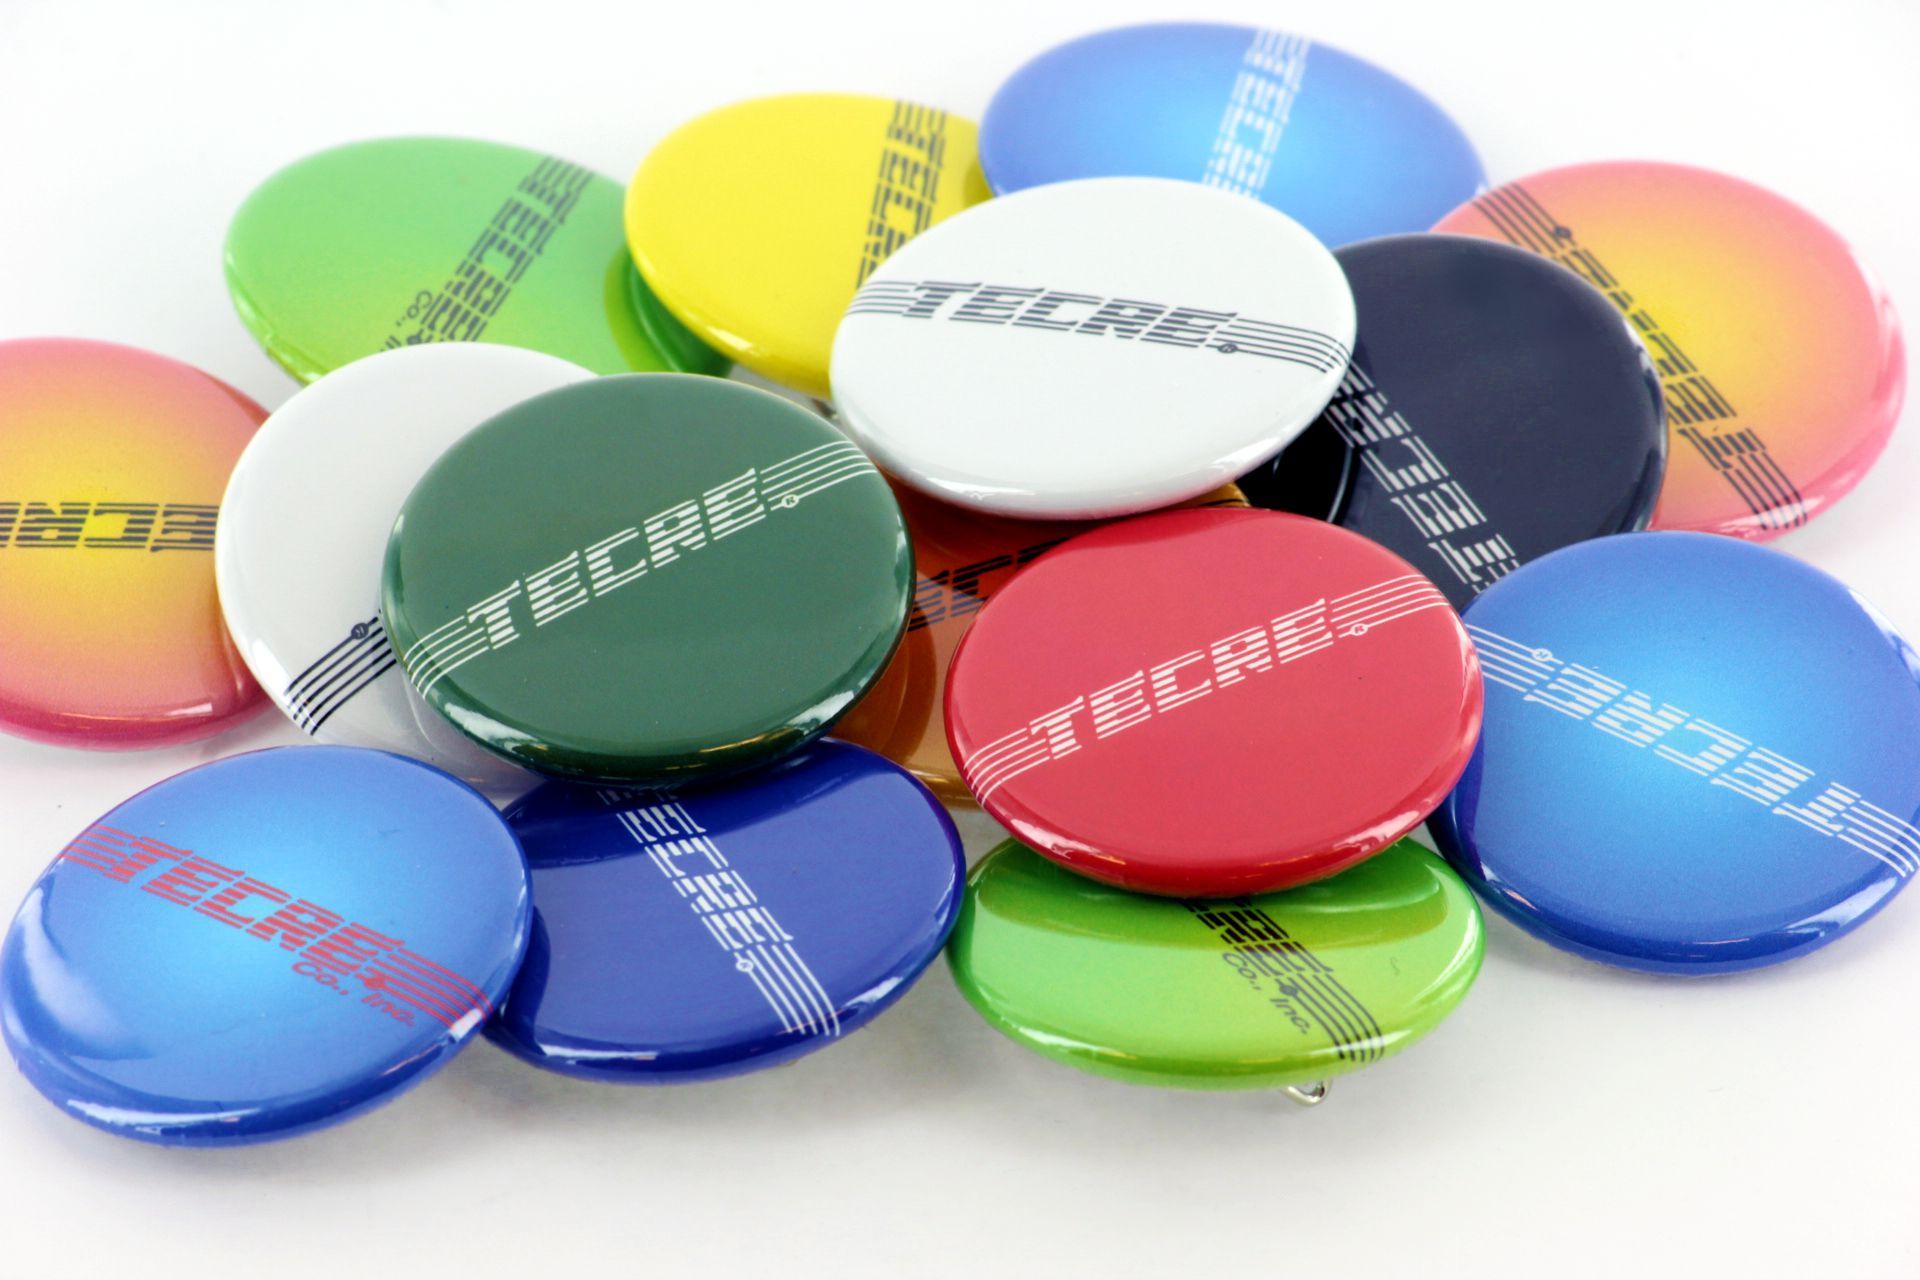 Button Making Supplies and Tecre Button Maker Machine